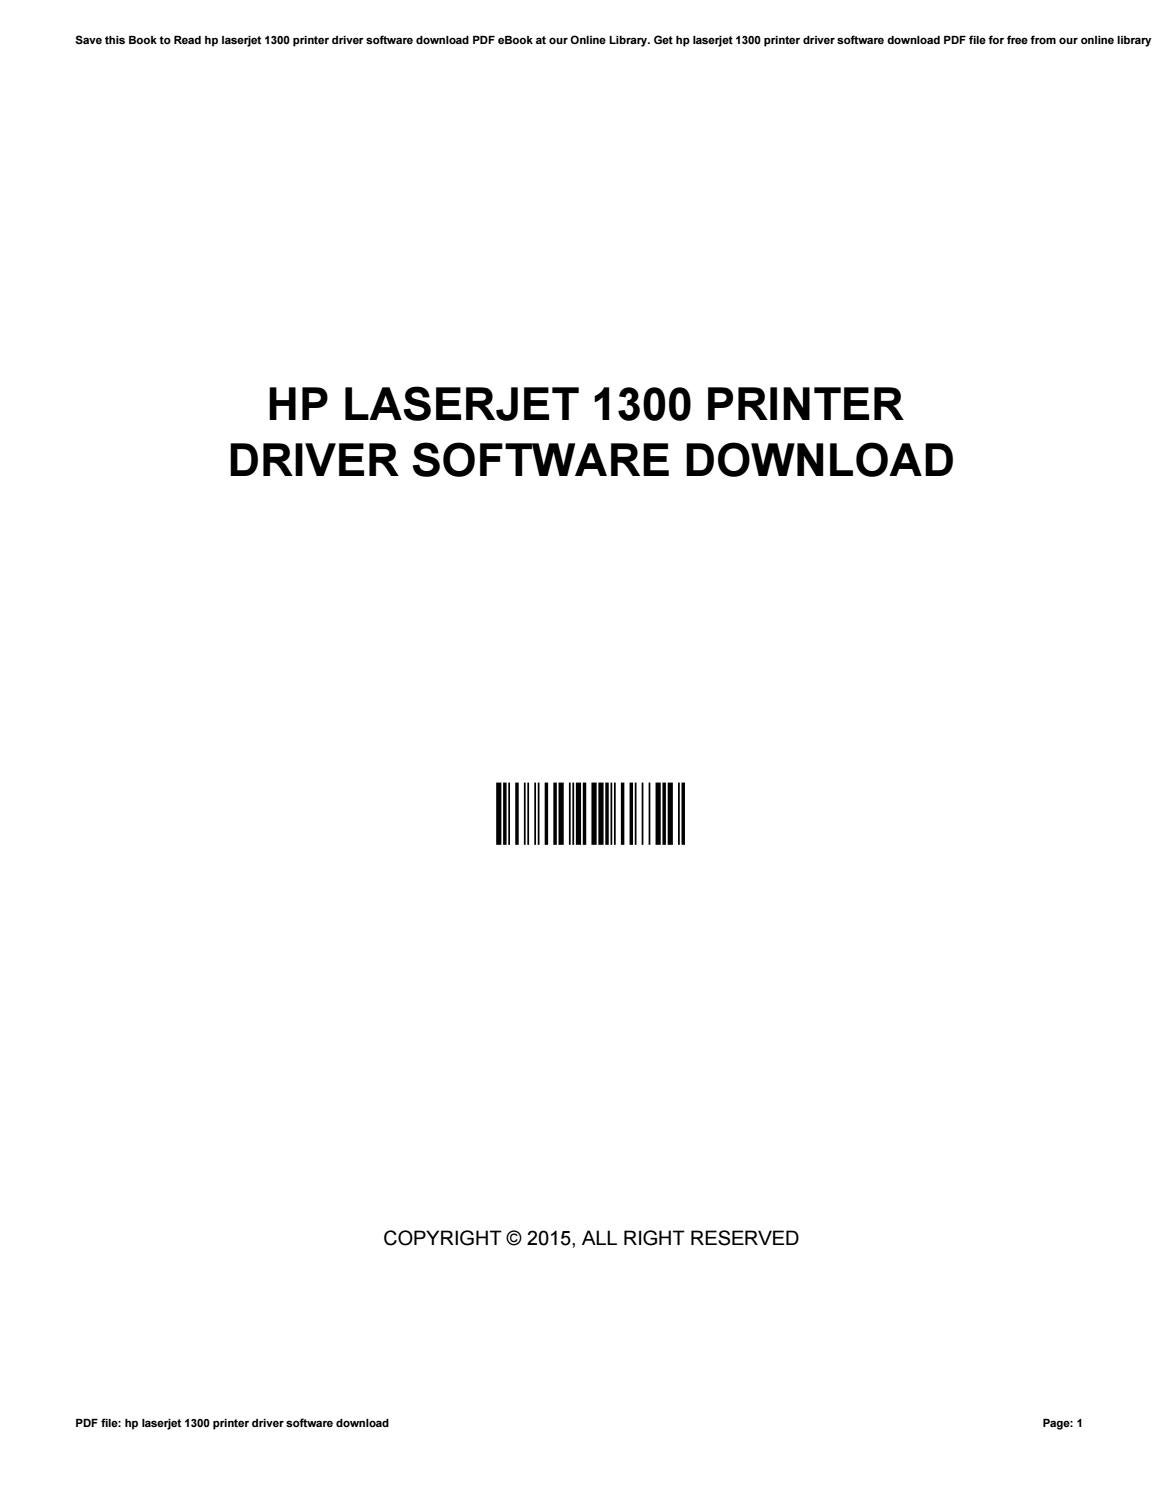 PILOTE HP LASERJET 1300N